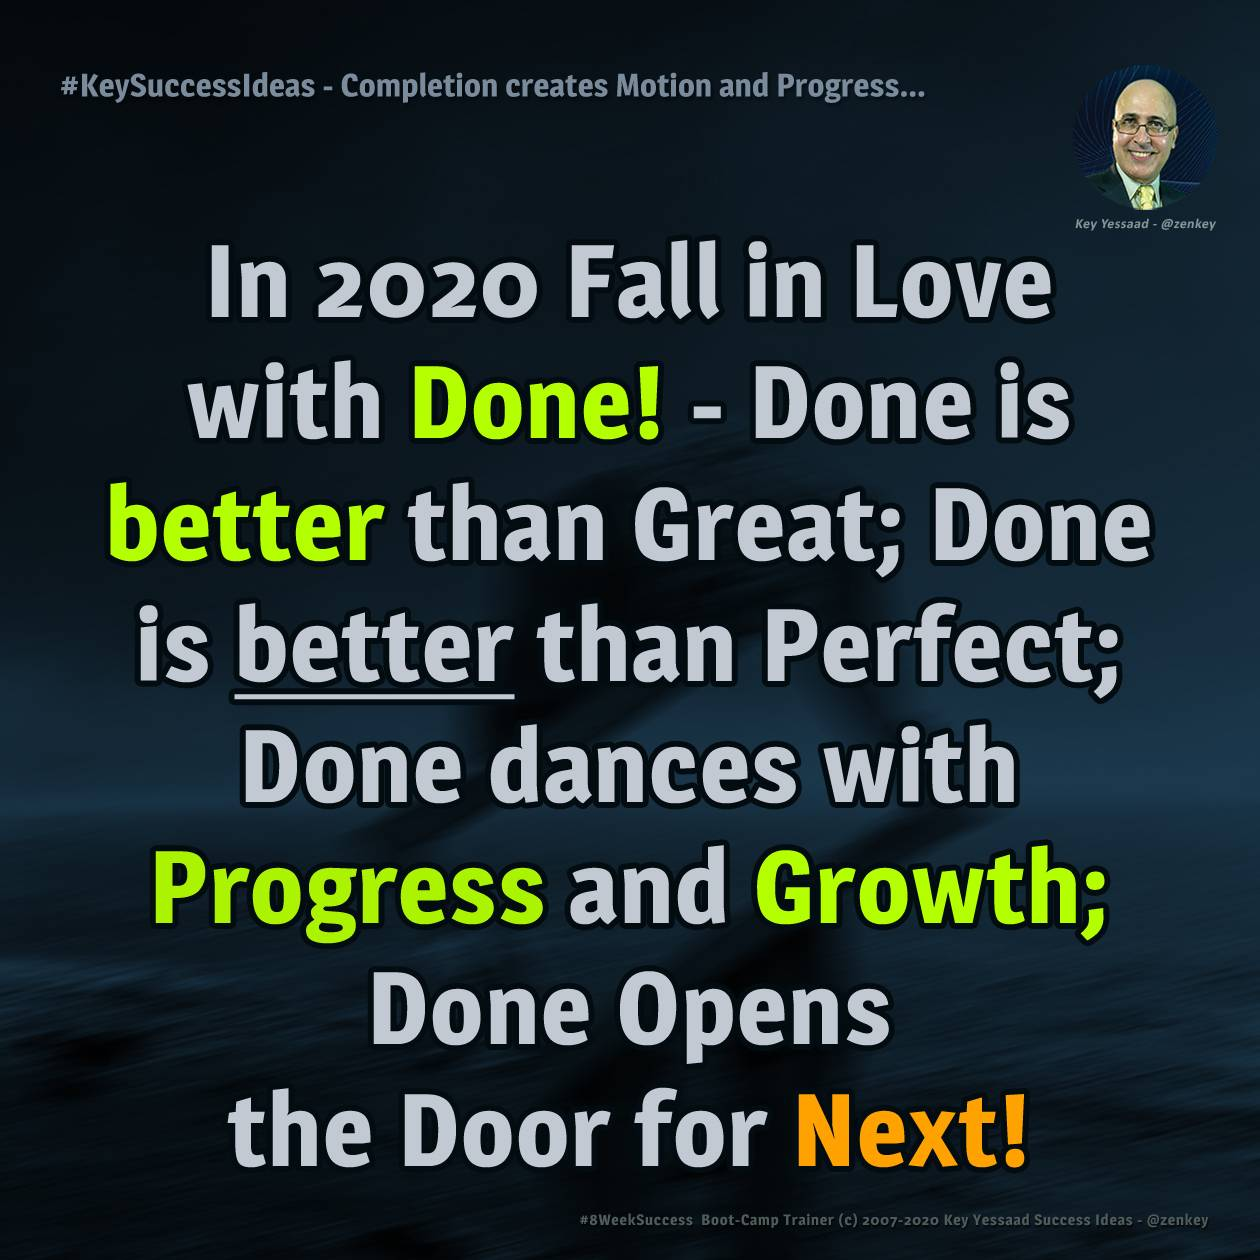 Completion creates Motion and Progress... - #KeySuccessIdeas